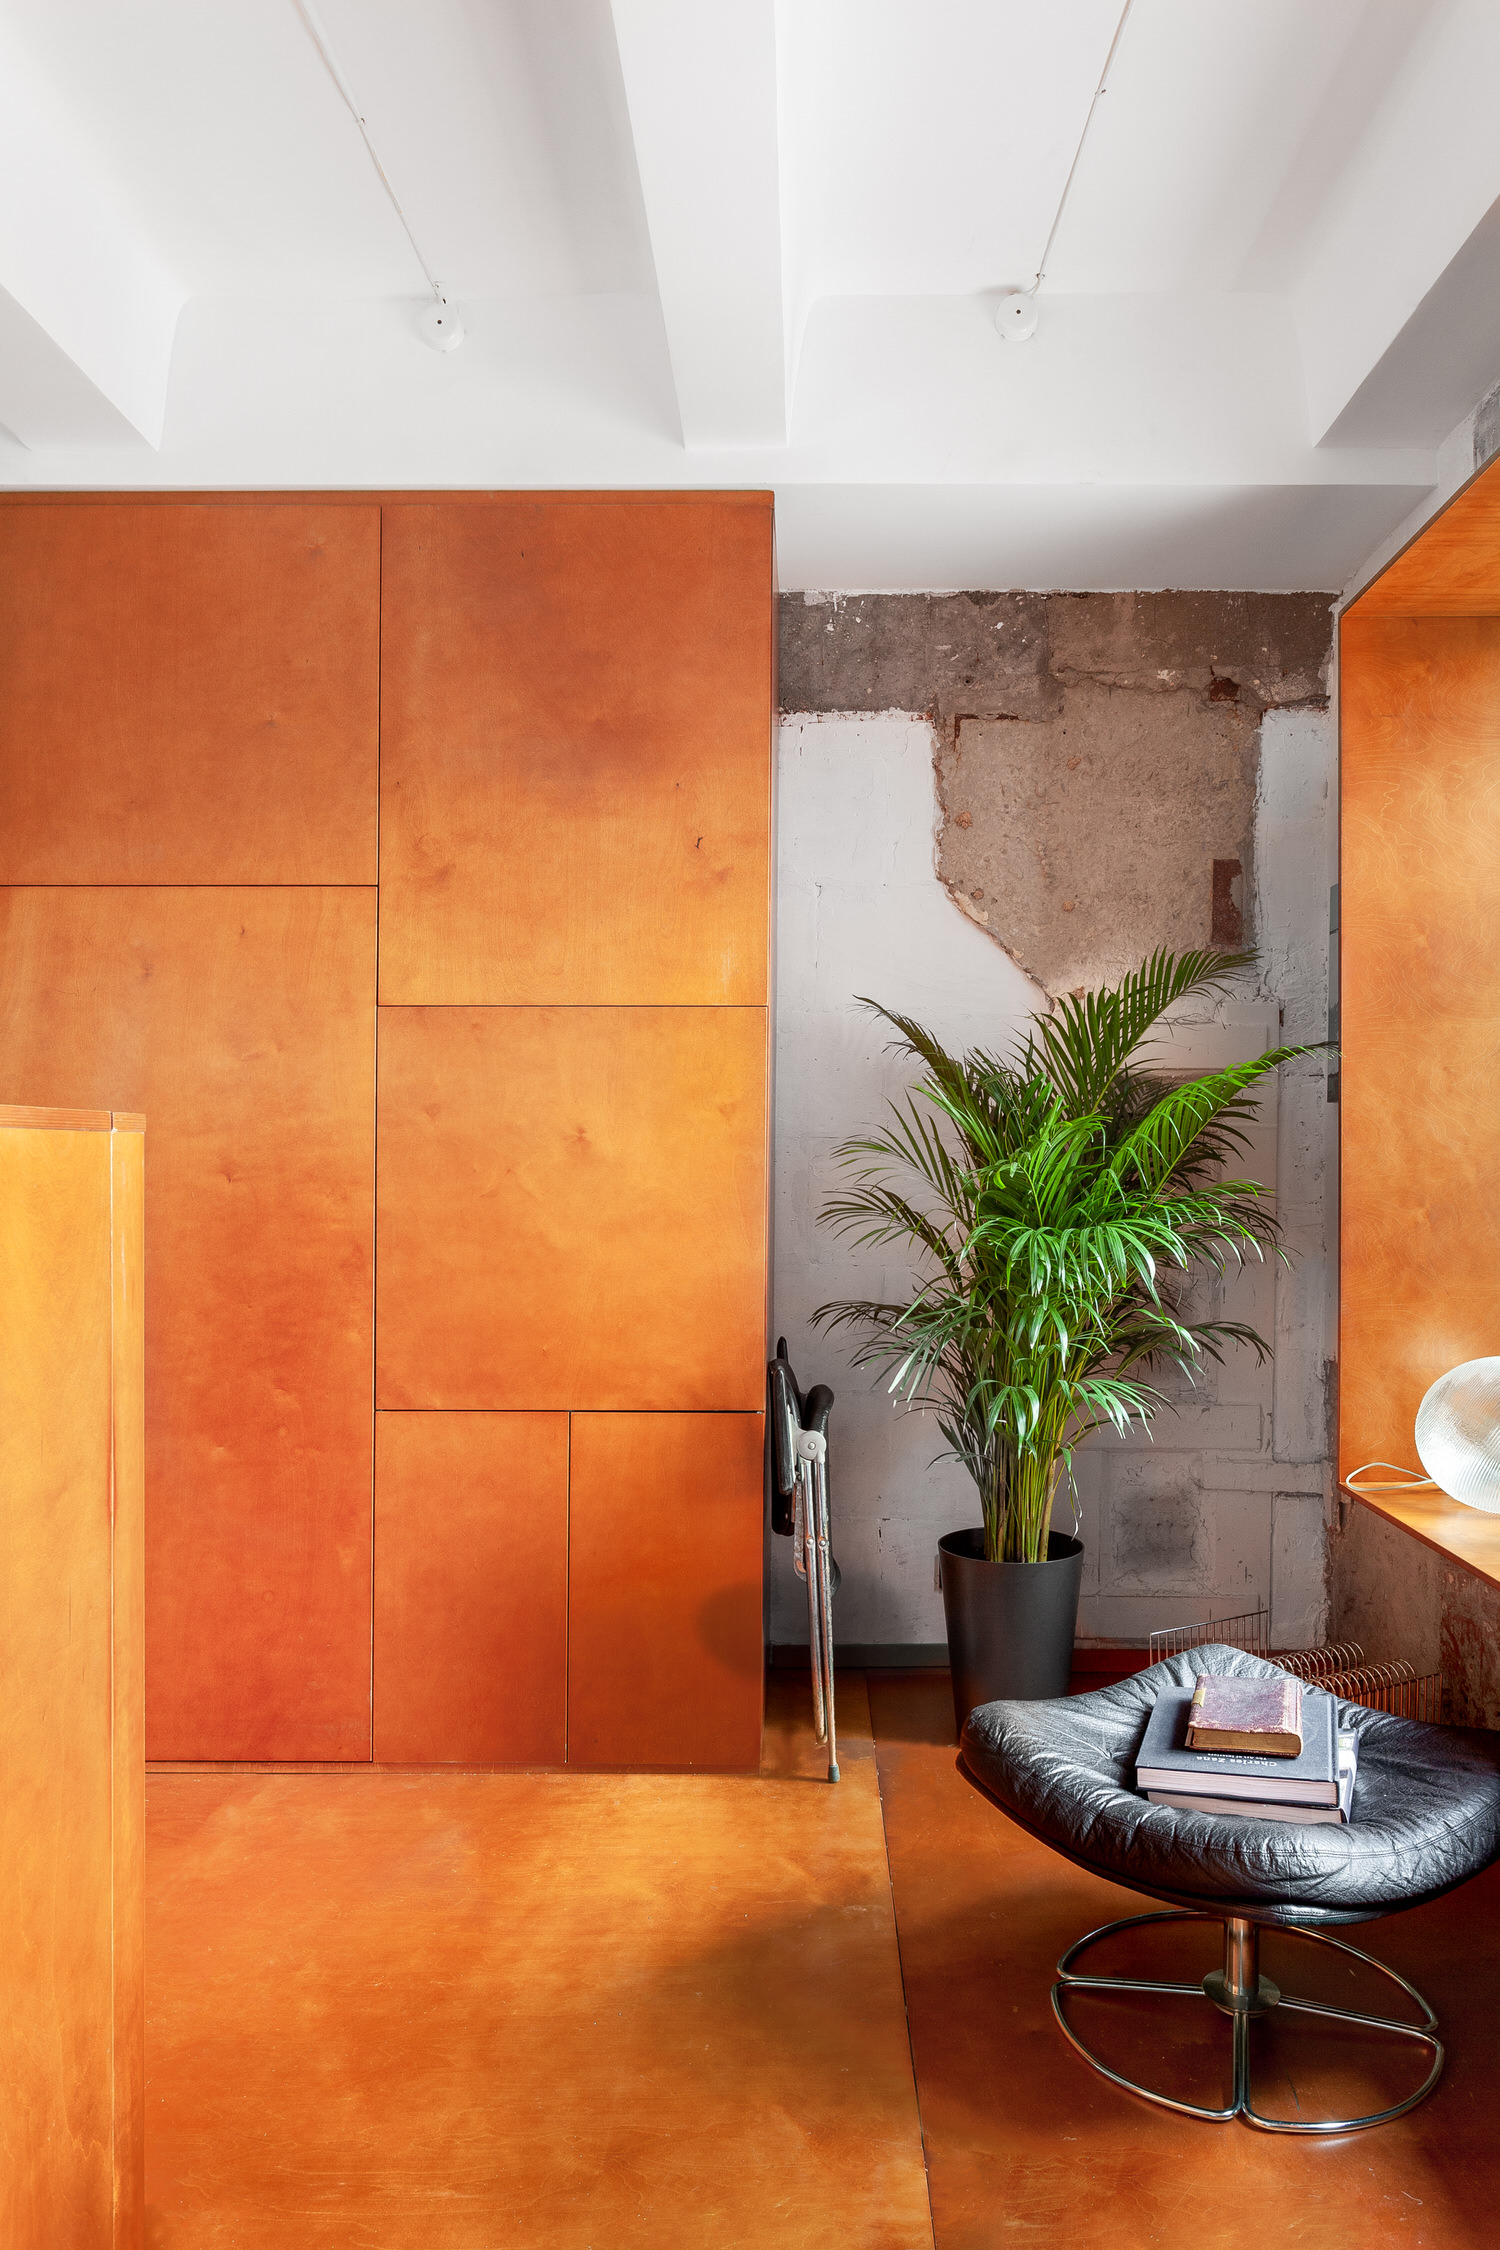 Room Design Buro Commune 303 Tiny Moscow Apartment Interior Photo Polina Poludkina Yellowtrace 22